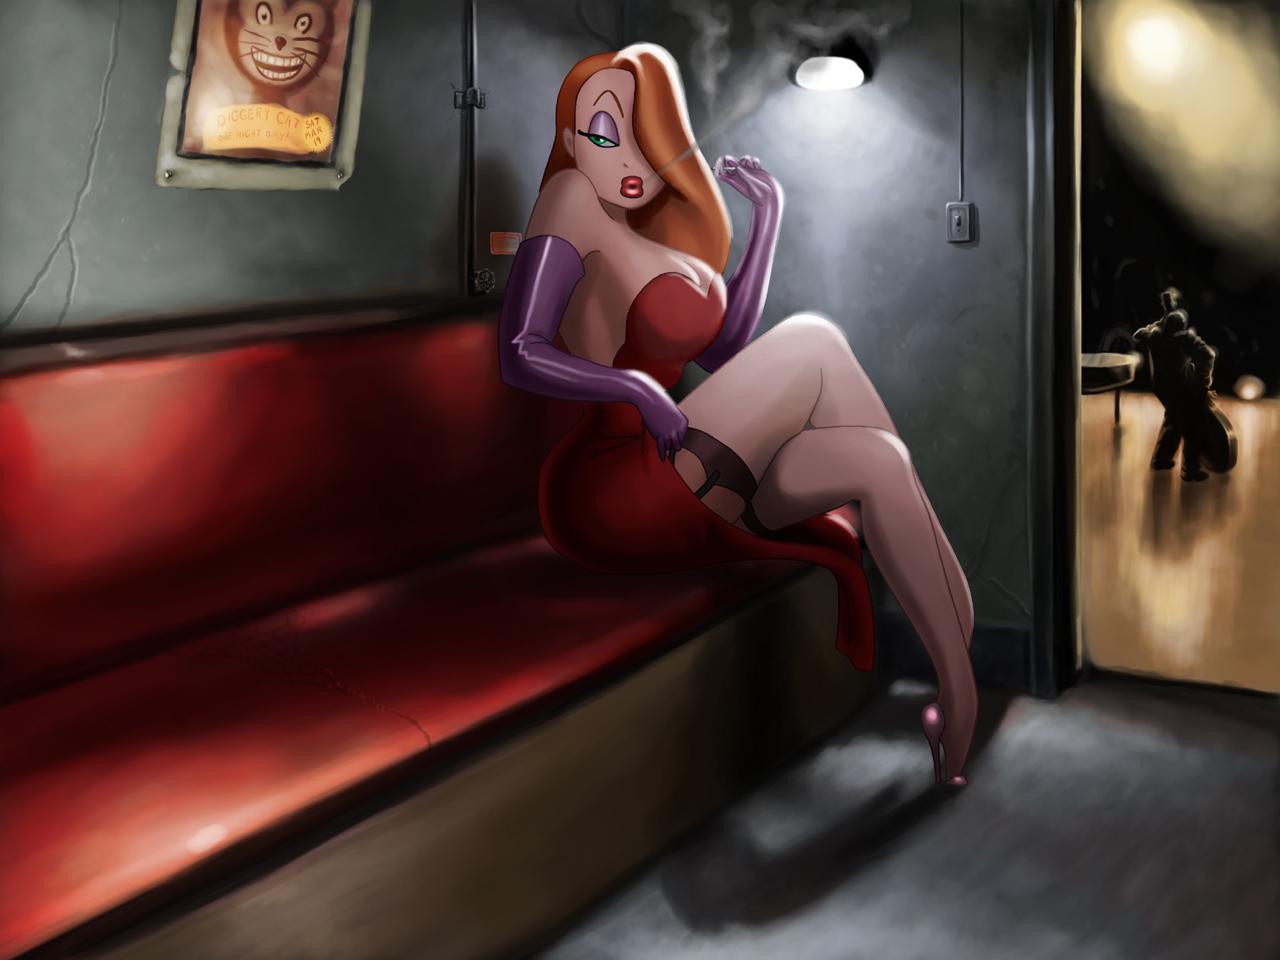 Smut cartoons fucks images